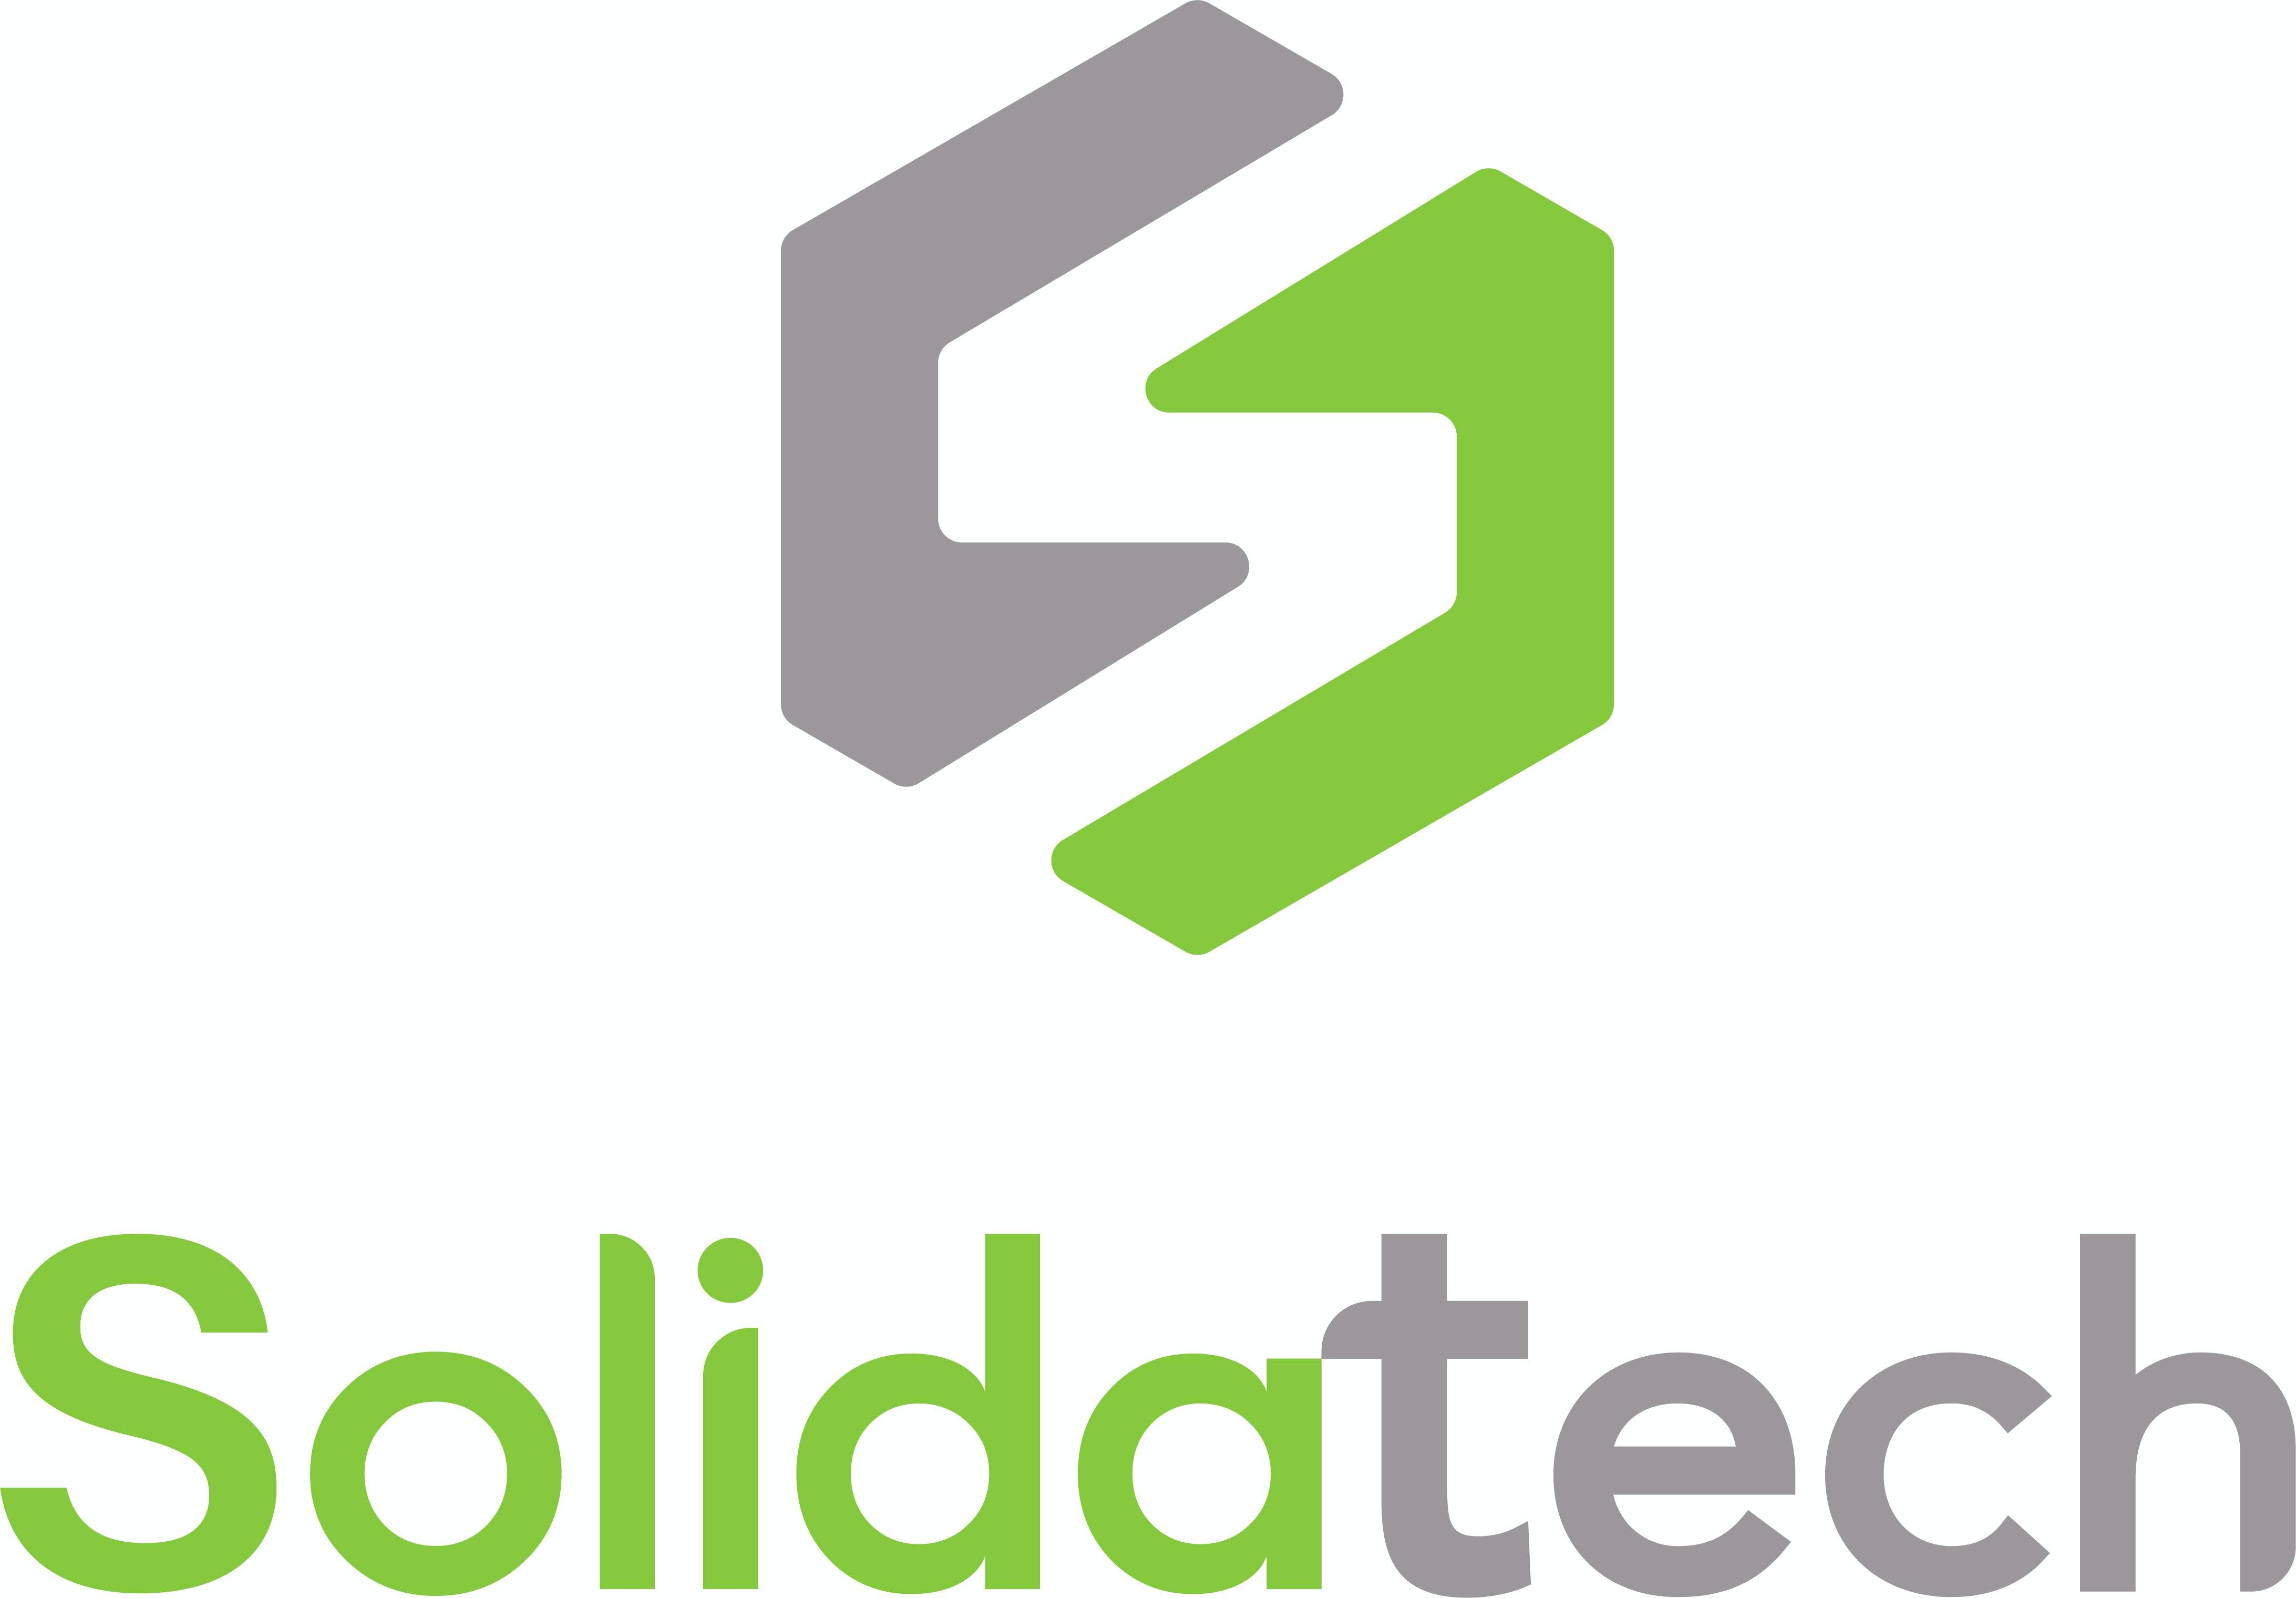 Solidatech Logo 2019 300dpi Hd